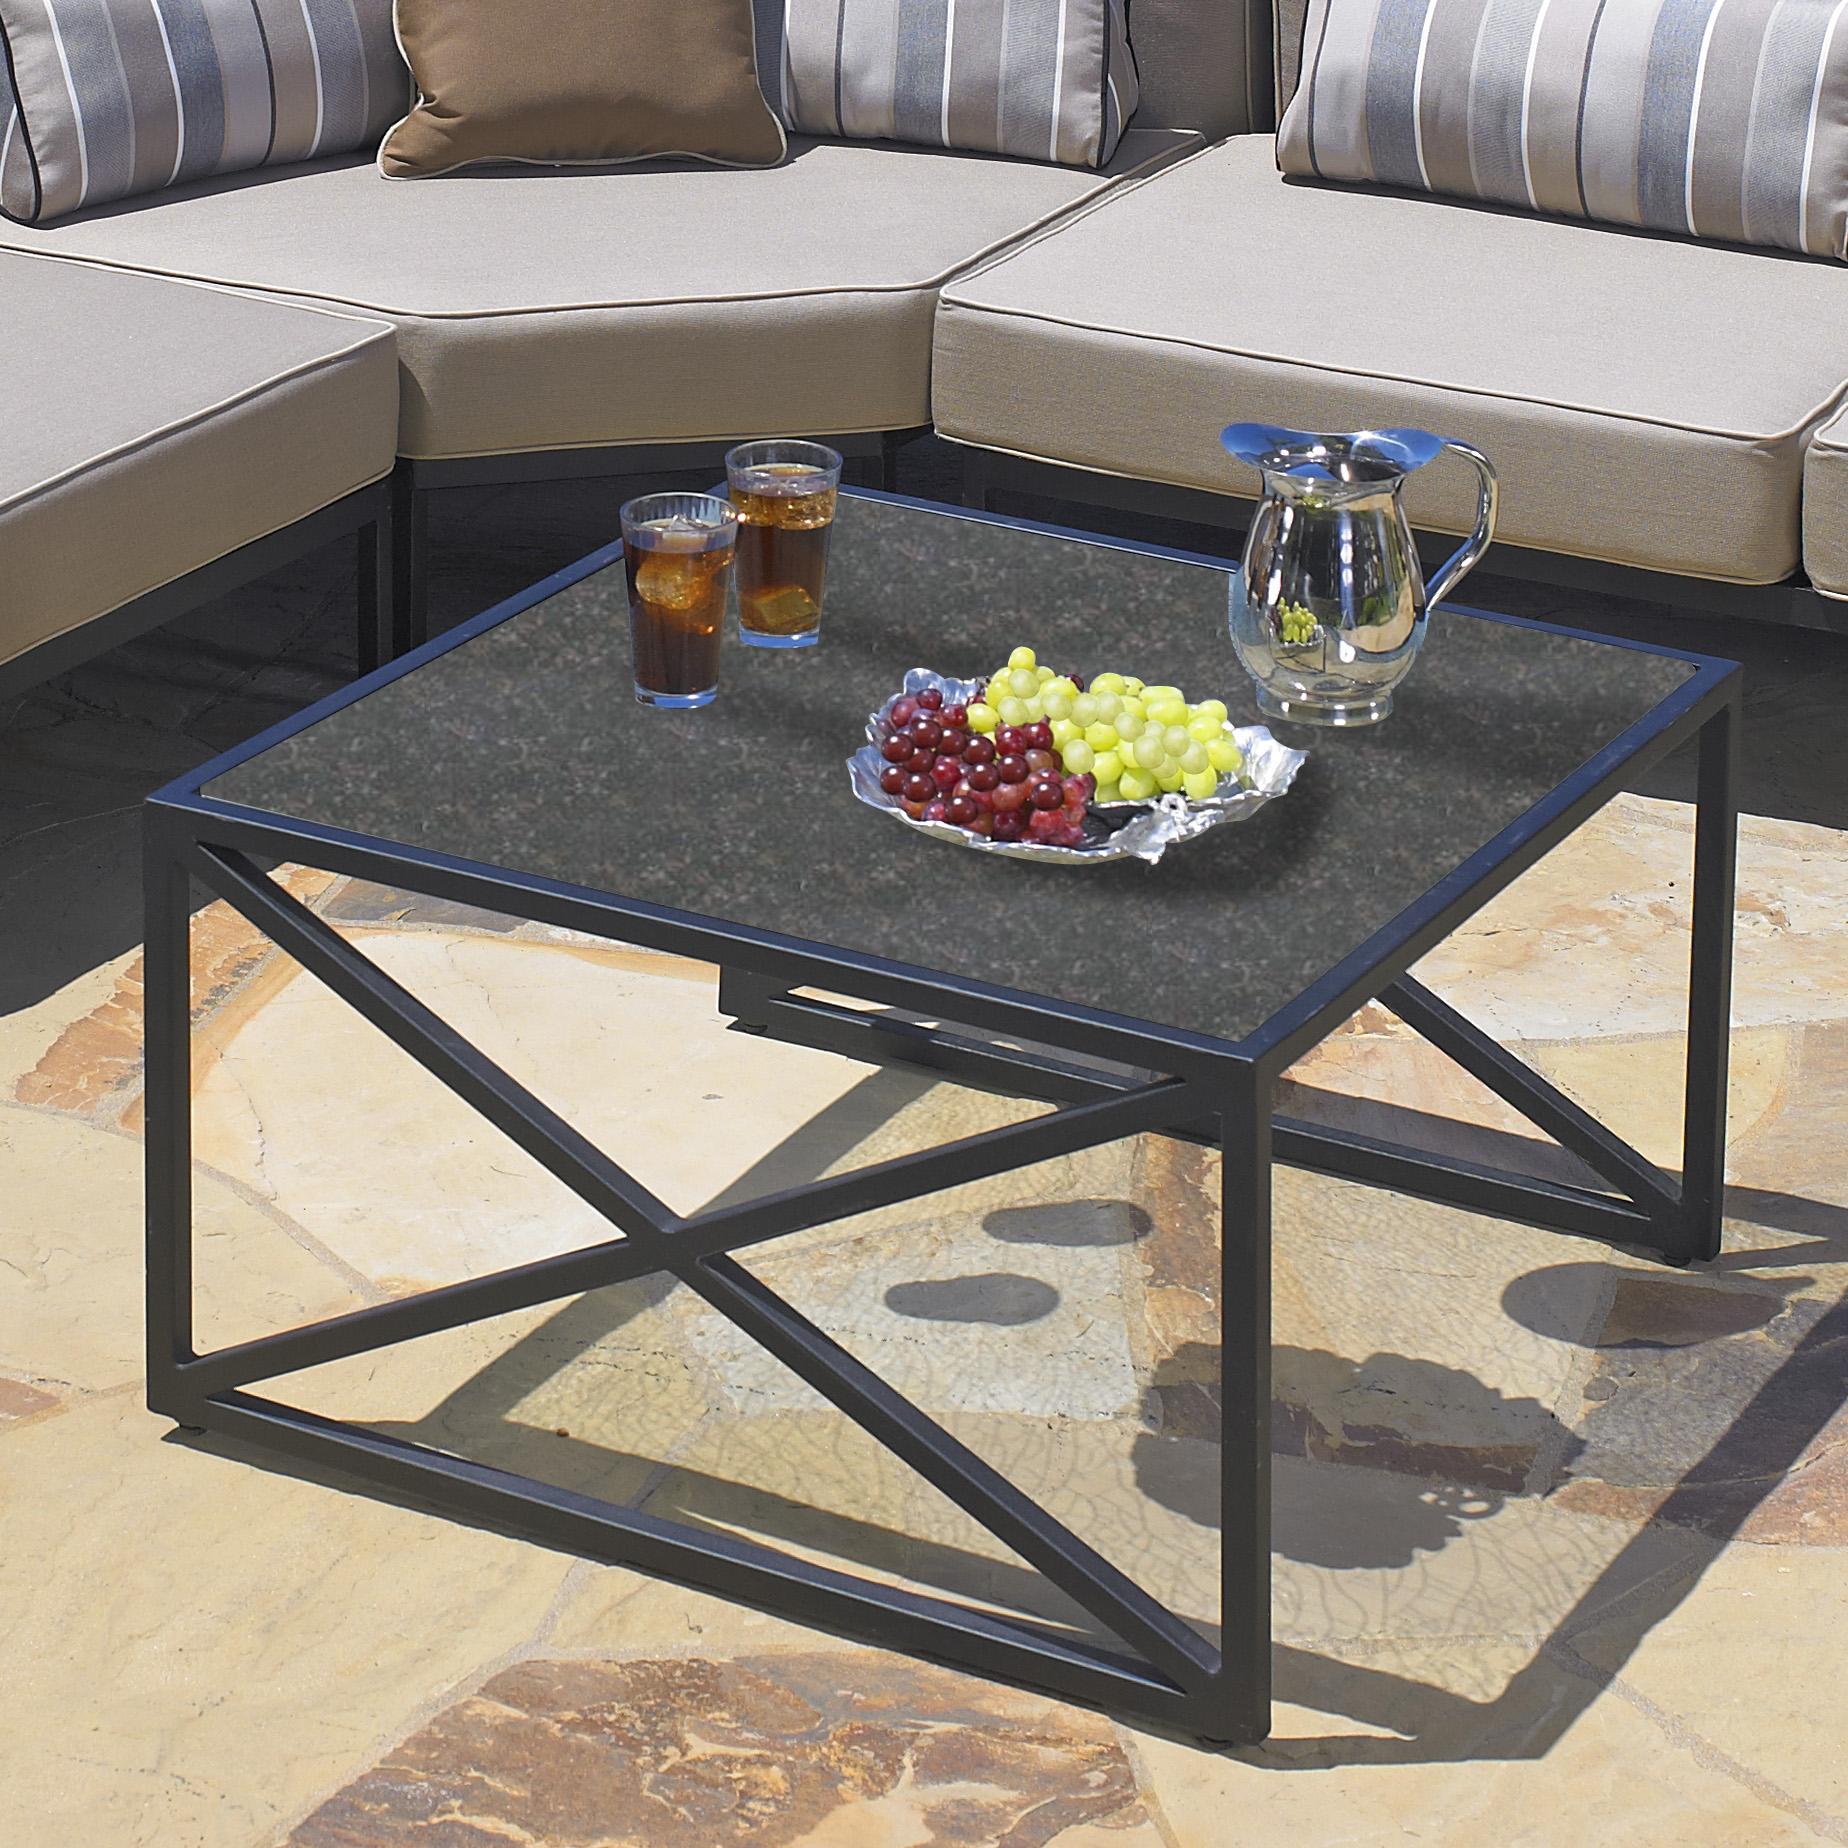 NorthCape International Outdoor Furniture